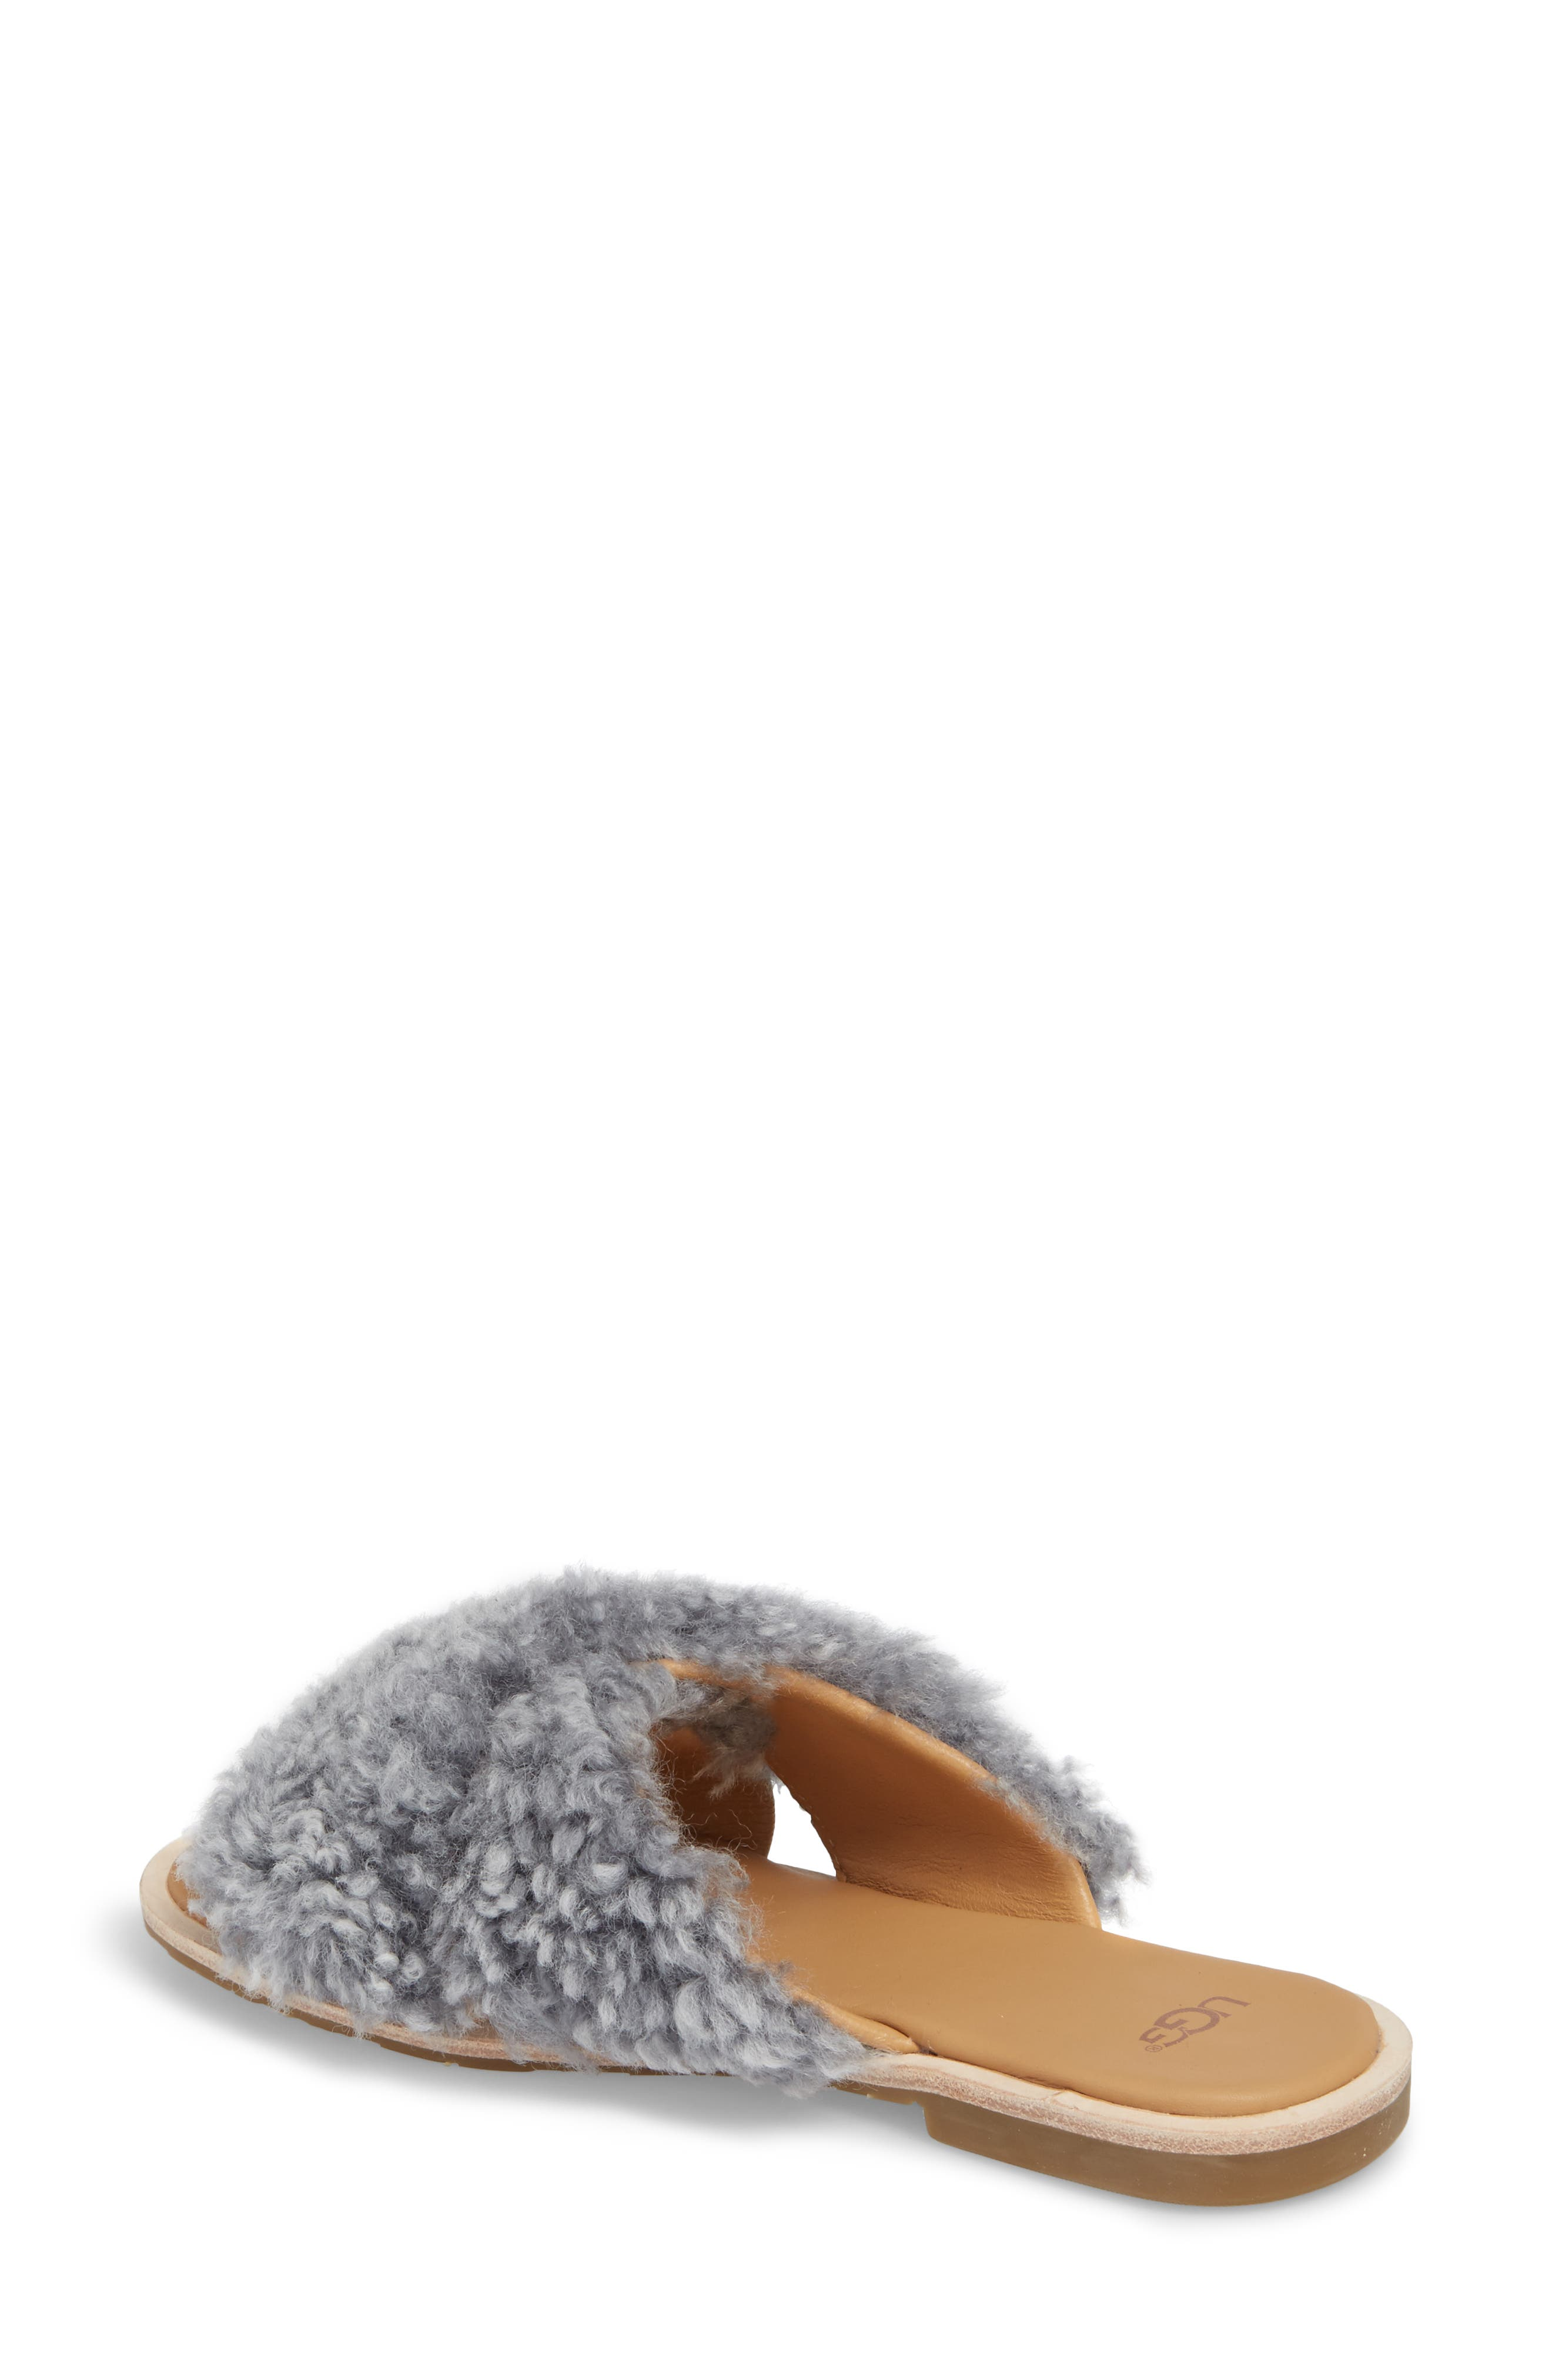 Joni Genuine Shearling Slide Sandal,                             Alternate thumbnail 2, color,                             Lude Grey